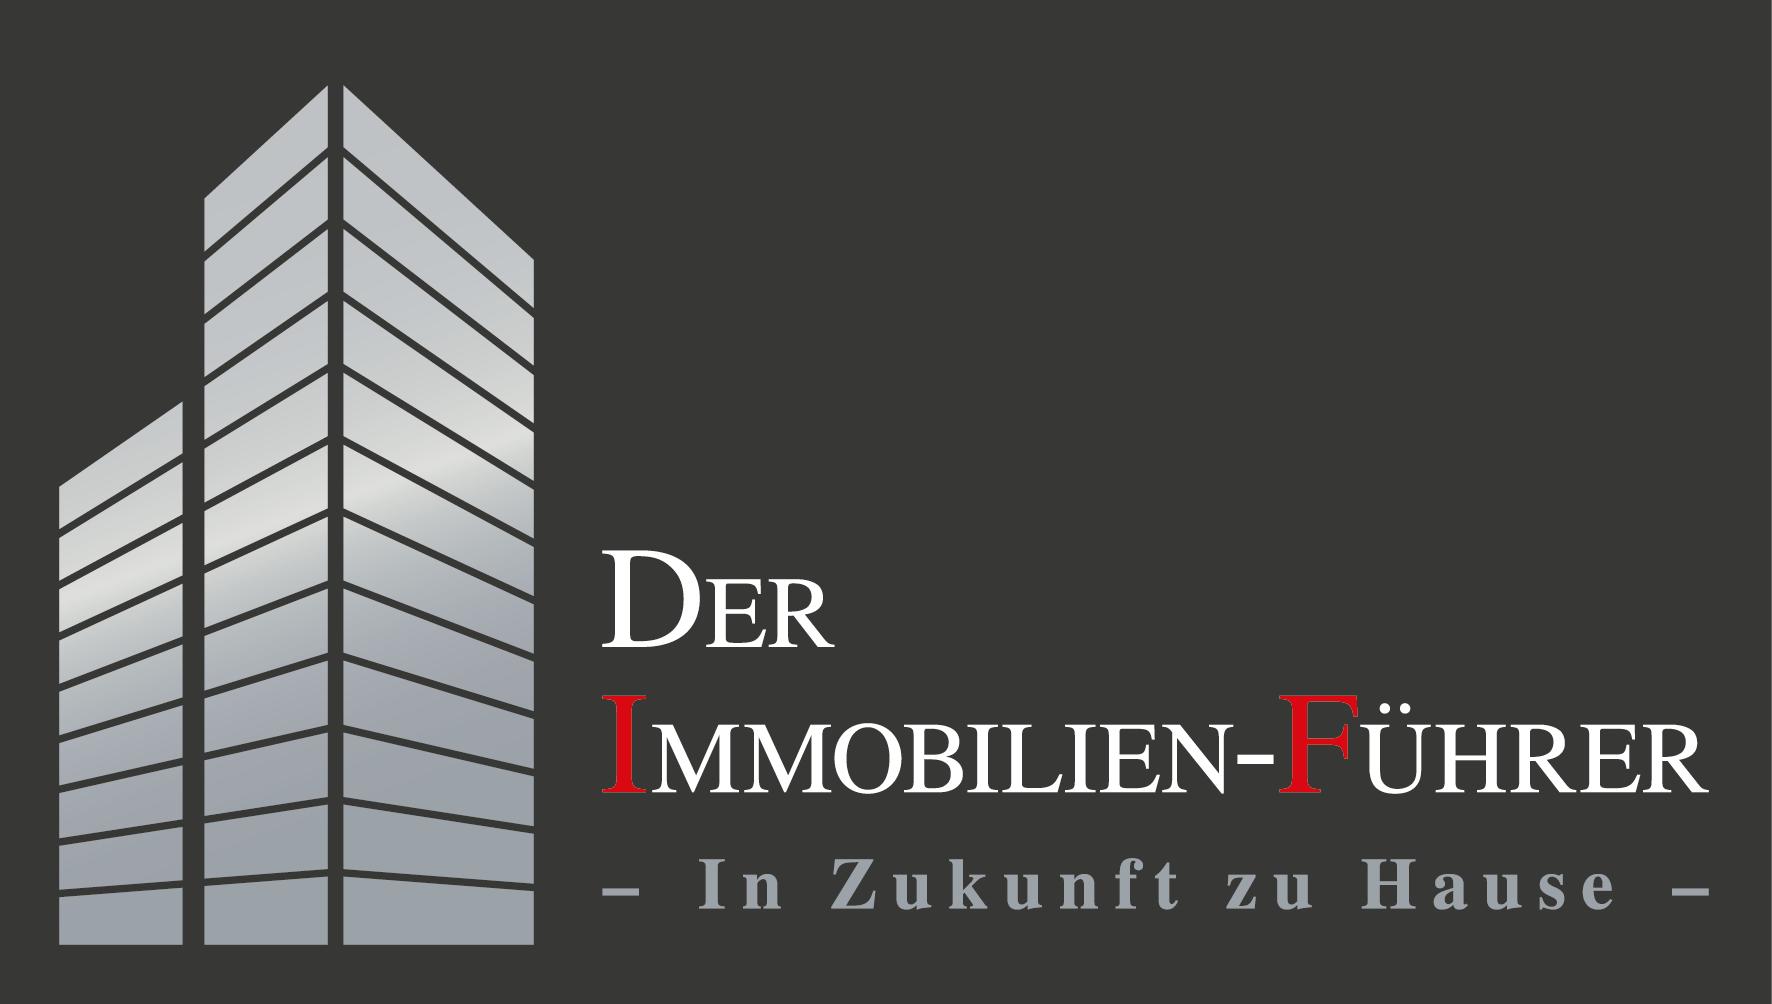 Immobilien-Führer GmbH